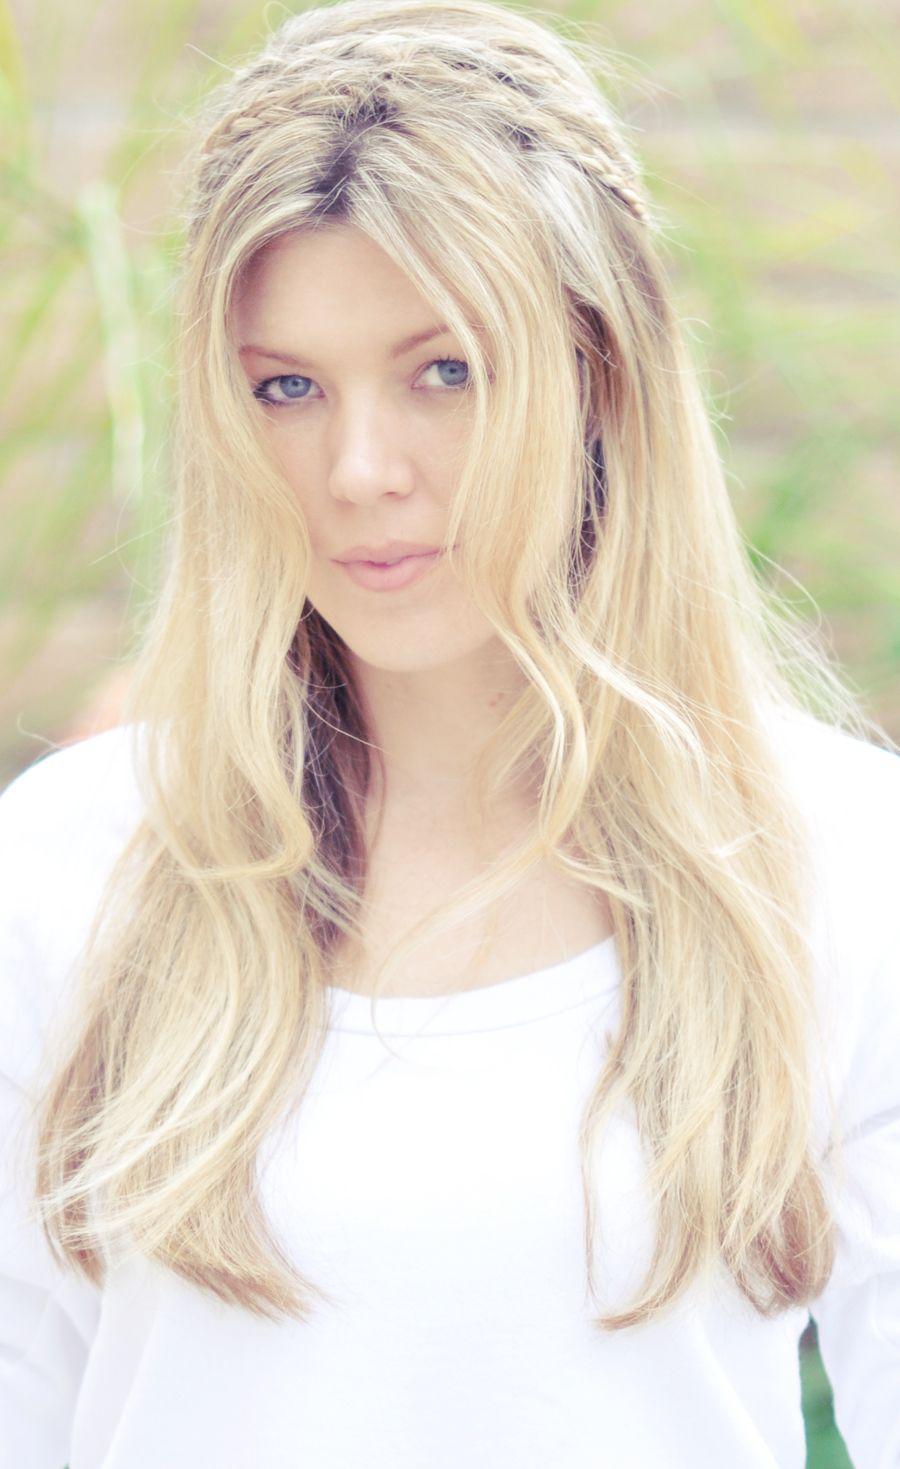 Hair blonde long braid wavy headband hair pinterest rope